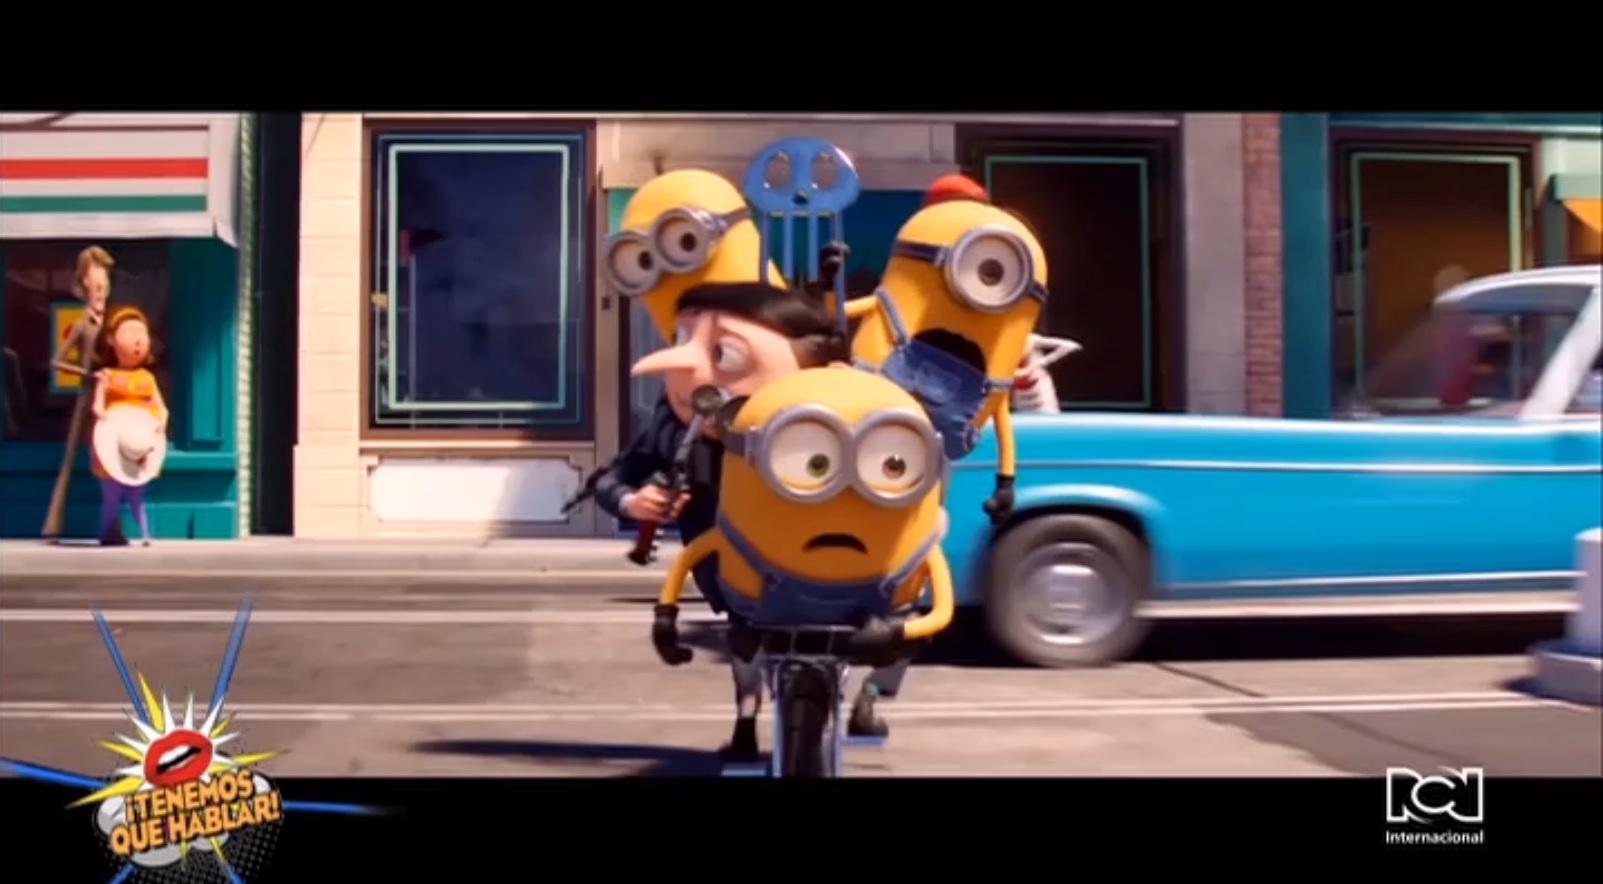 'Minions: The Rise of Gru' llegará a salas el 3 de julio gracias a Universal Pictures